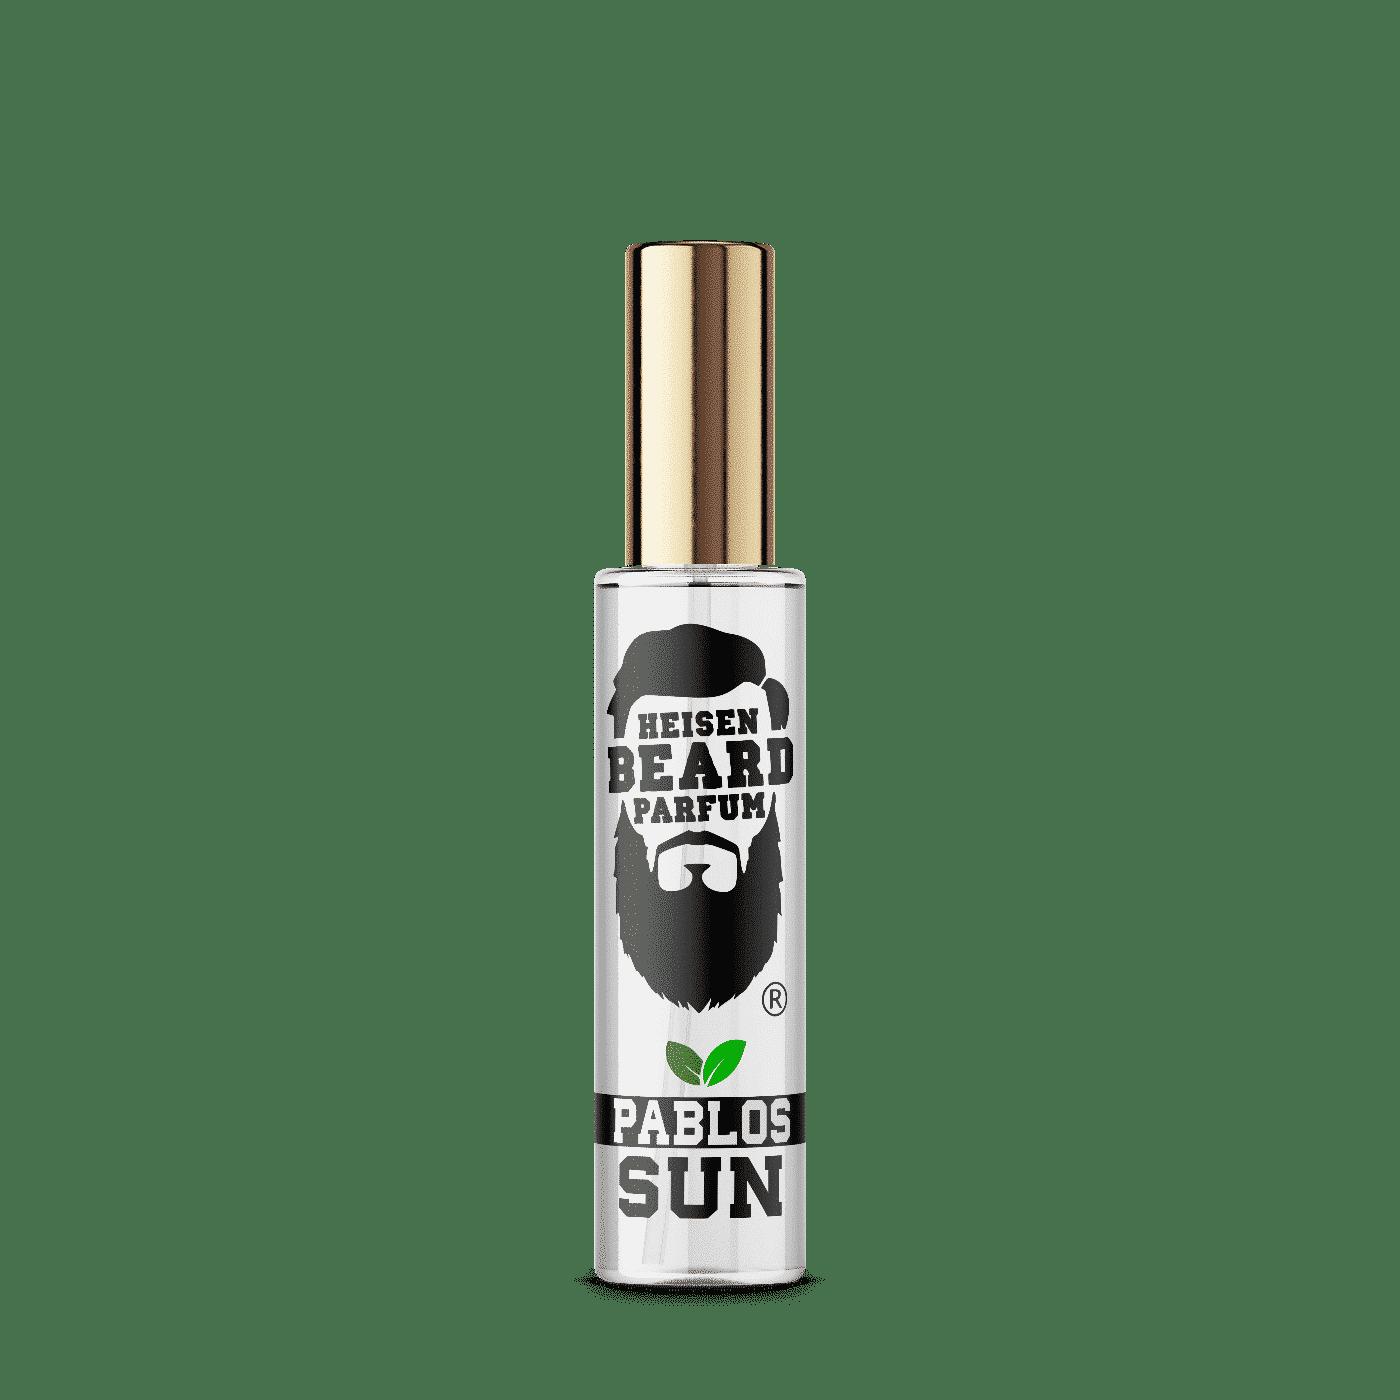 Männerdüfte: Eau de Parfum Heisenbeard Pablos Sun - süß & holzig